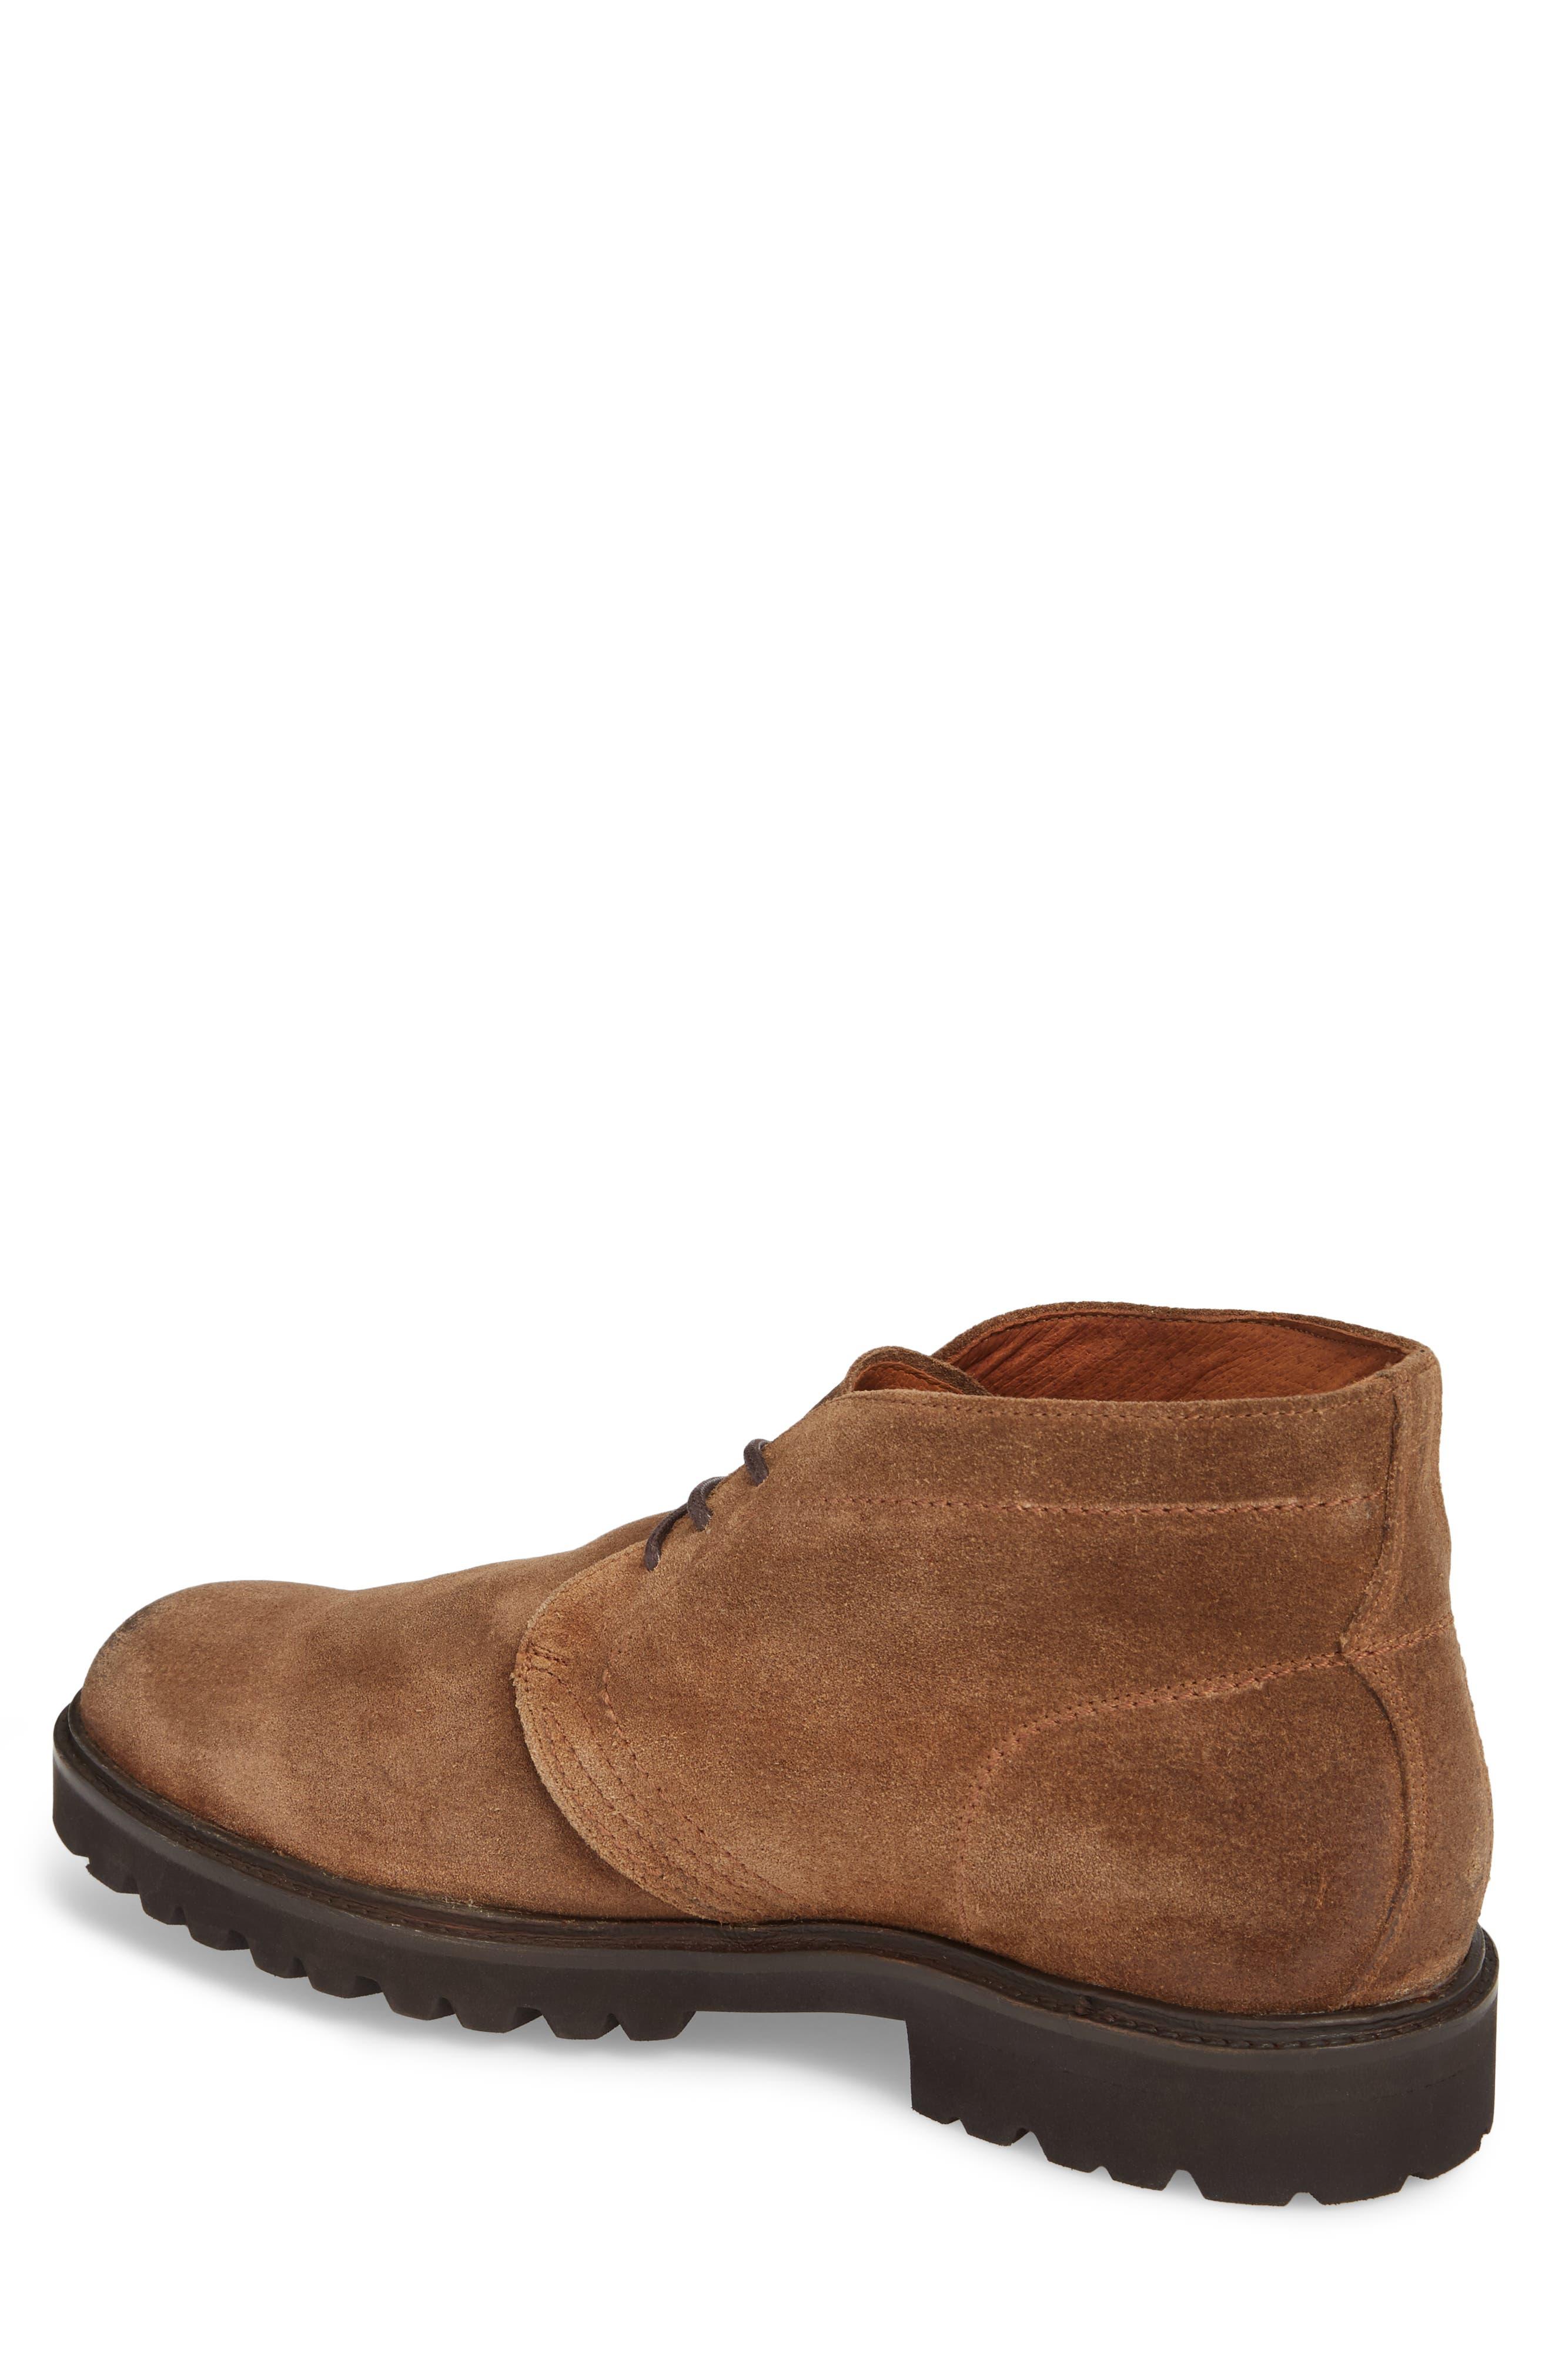 Edwin Waterproof Chukka Boot,                             Alternate thumbnail 2, color,                             Fawn Leather